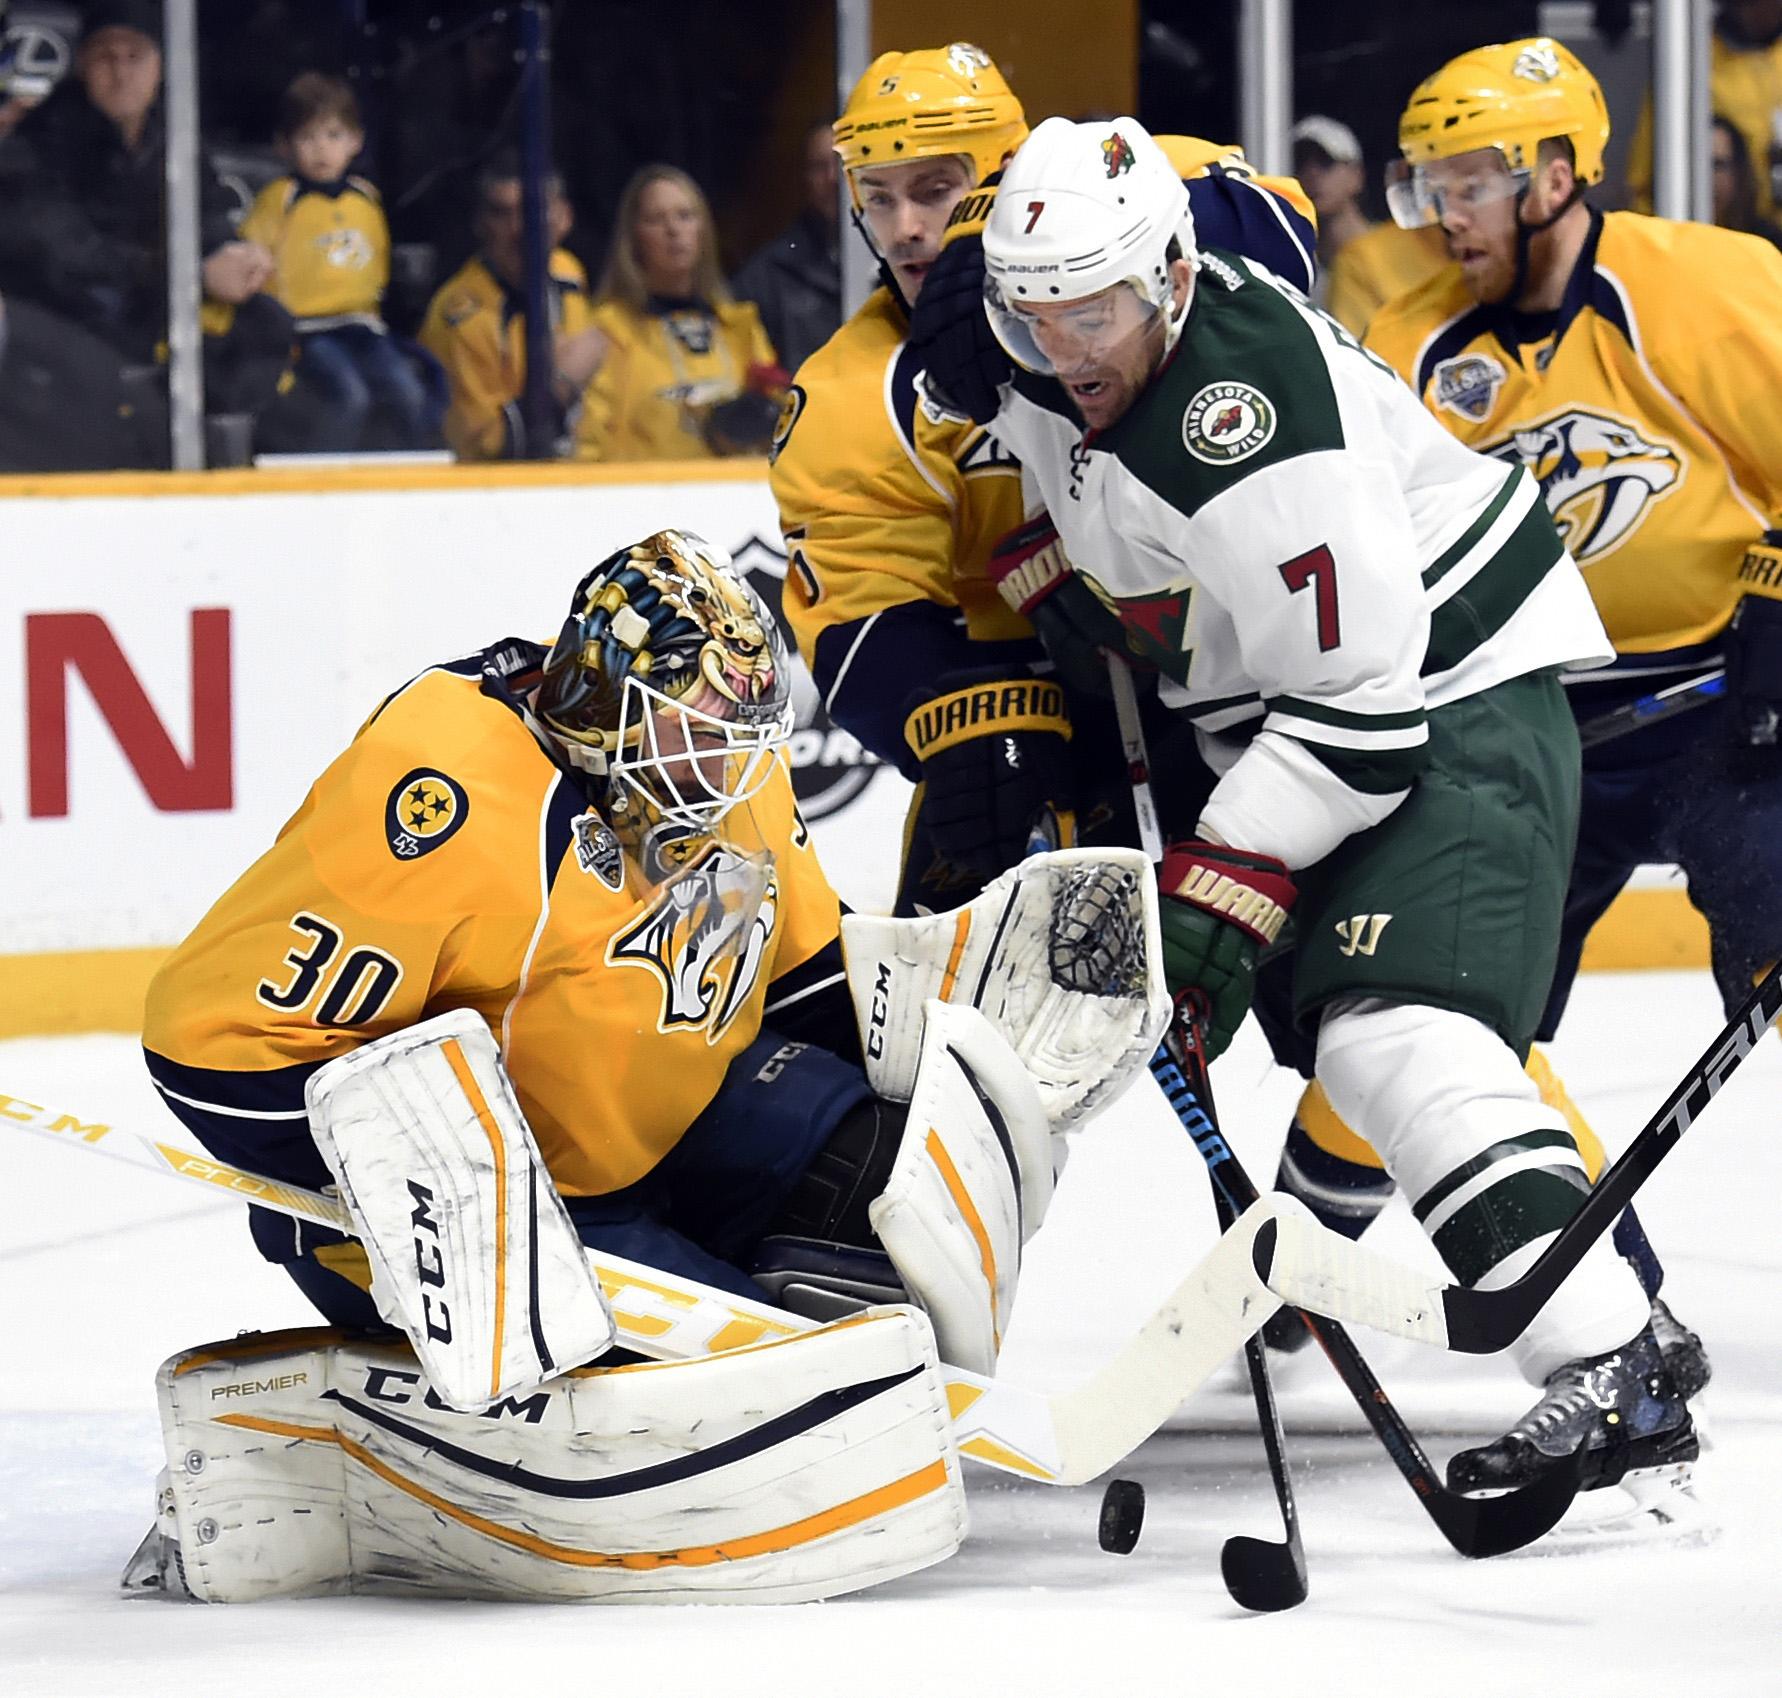 Nashville Predators goalie Carter Hutton (30) stops a shot by Minnesota Wild left wing Chris Porter (7) during the first period of an NHL hockey game Saturday, Jan. 16, 2016, in Nashville, Tenn. (AP Photo/Mark Zaleski)